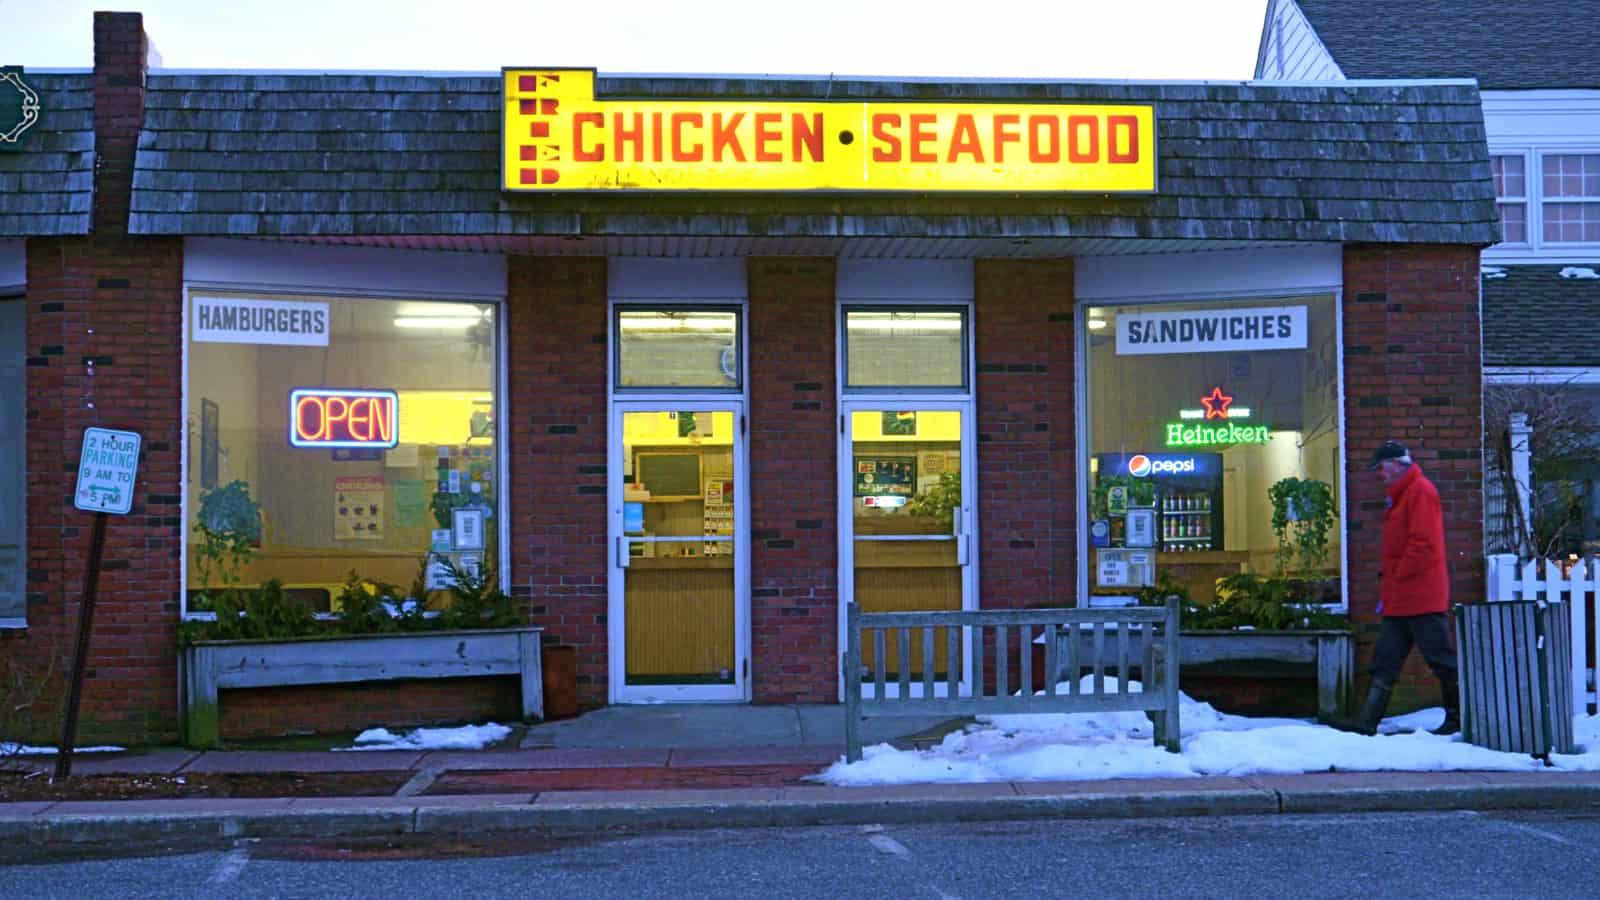 Chicken • Seafood, The Plaza, February 2013, Montauk NY, photo by Sailing Montauk